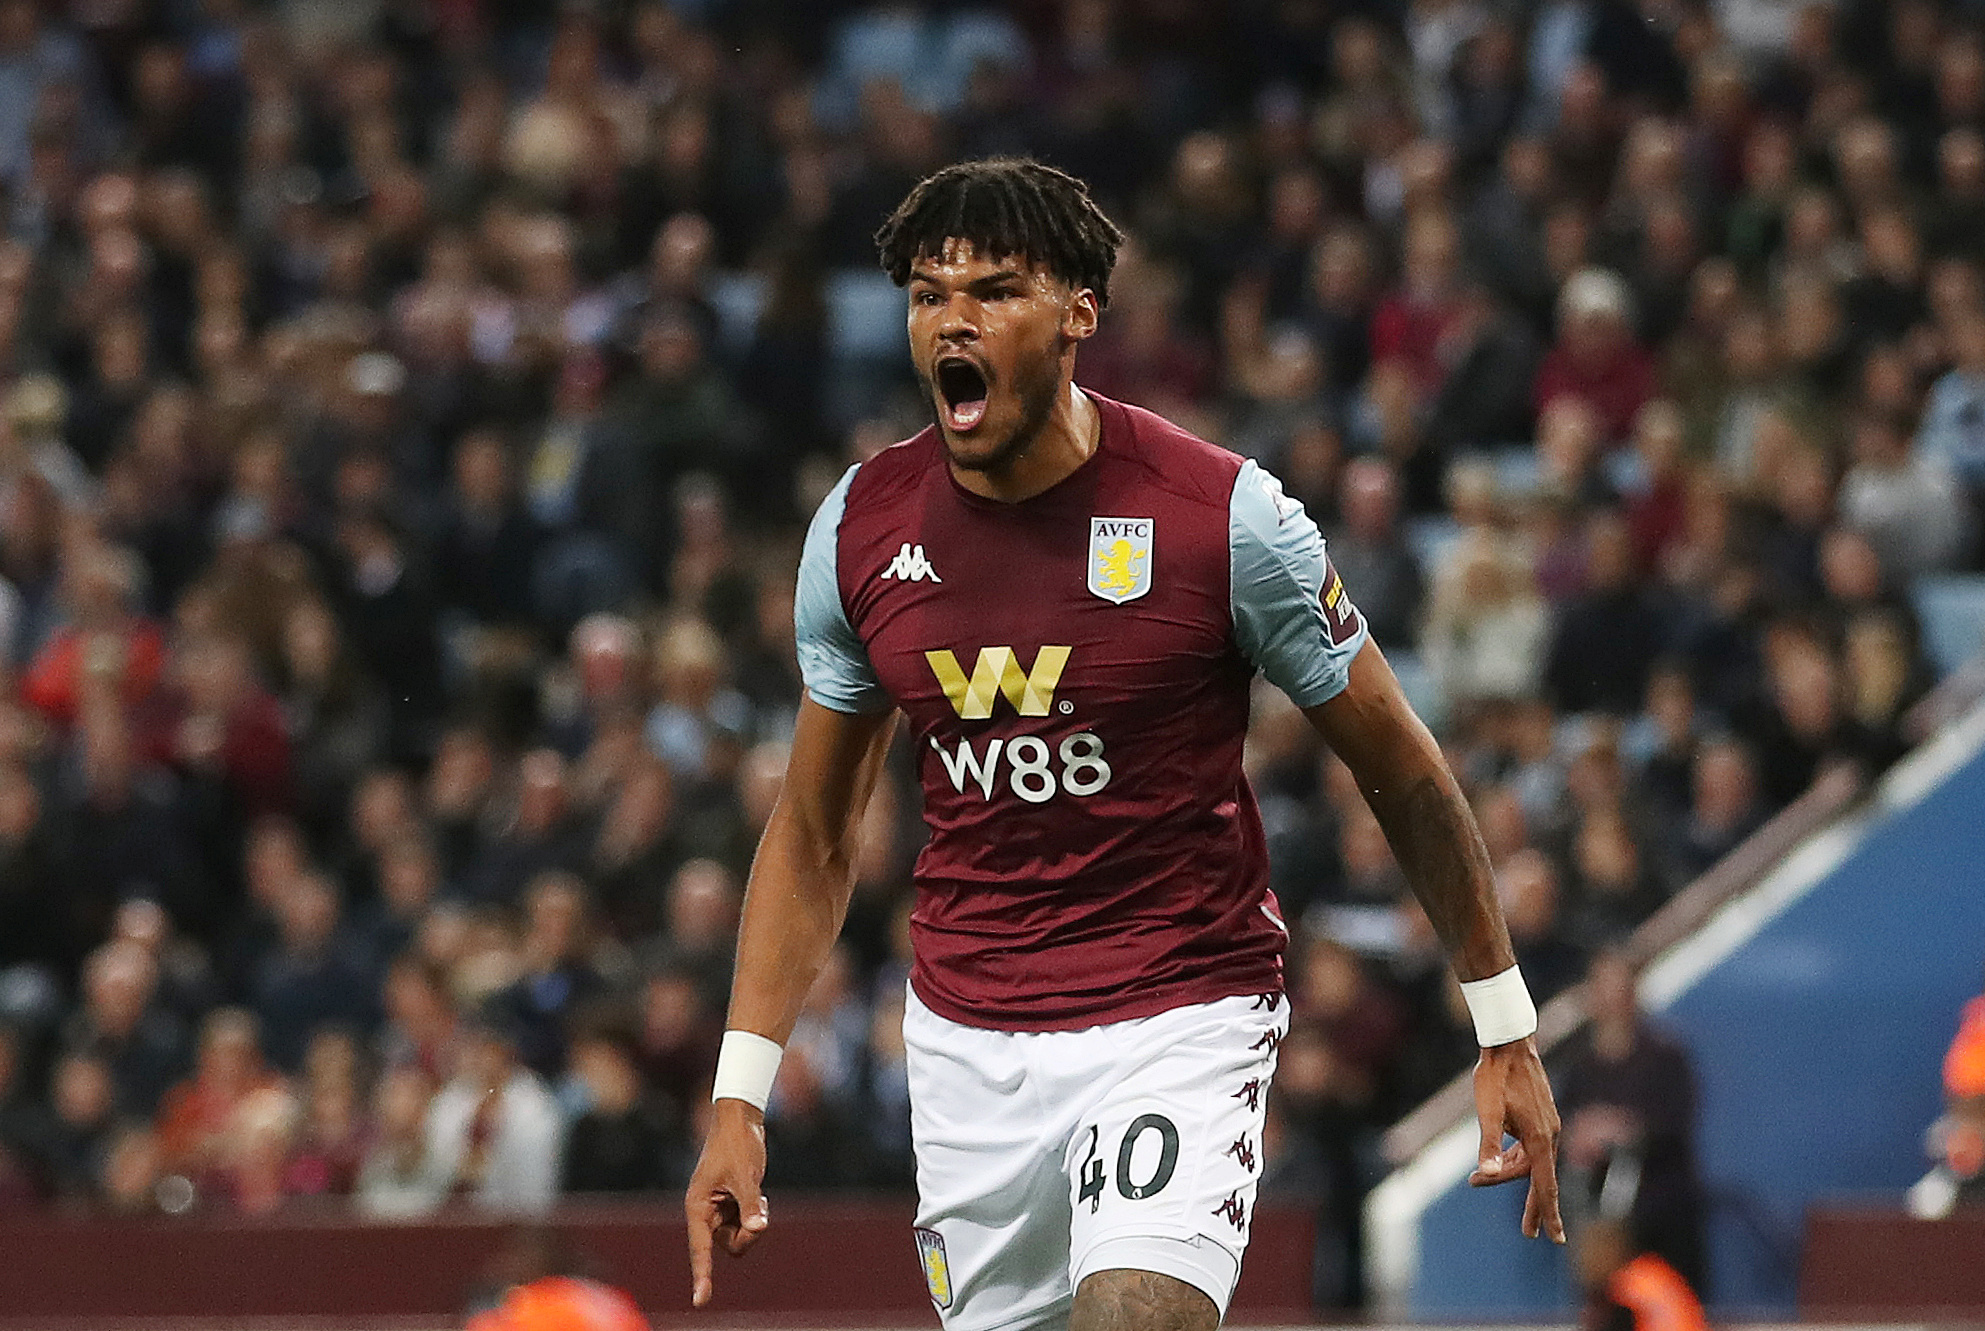 Aston Villa FC Defenders 2020/21: Tyrone Mings